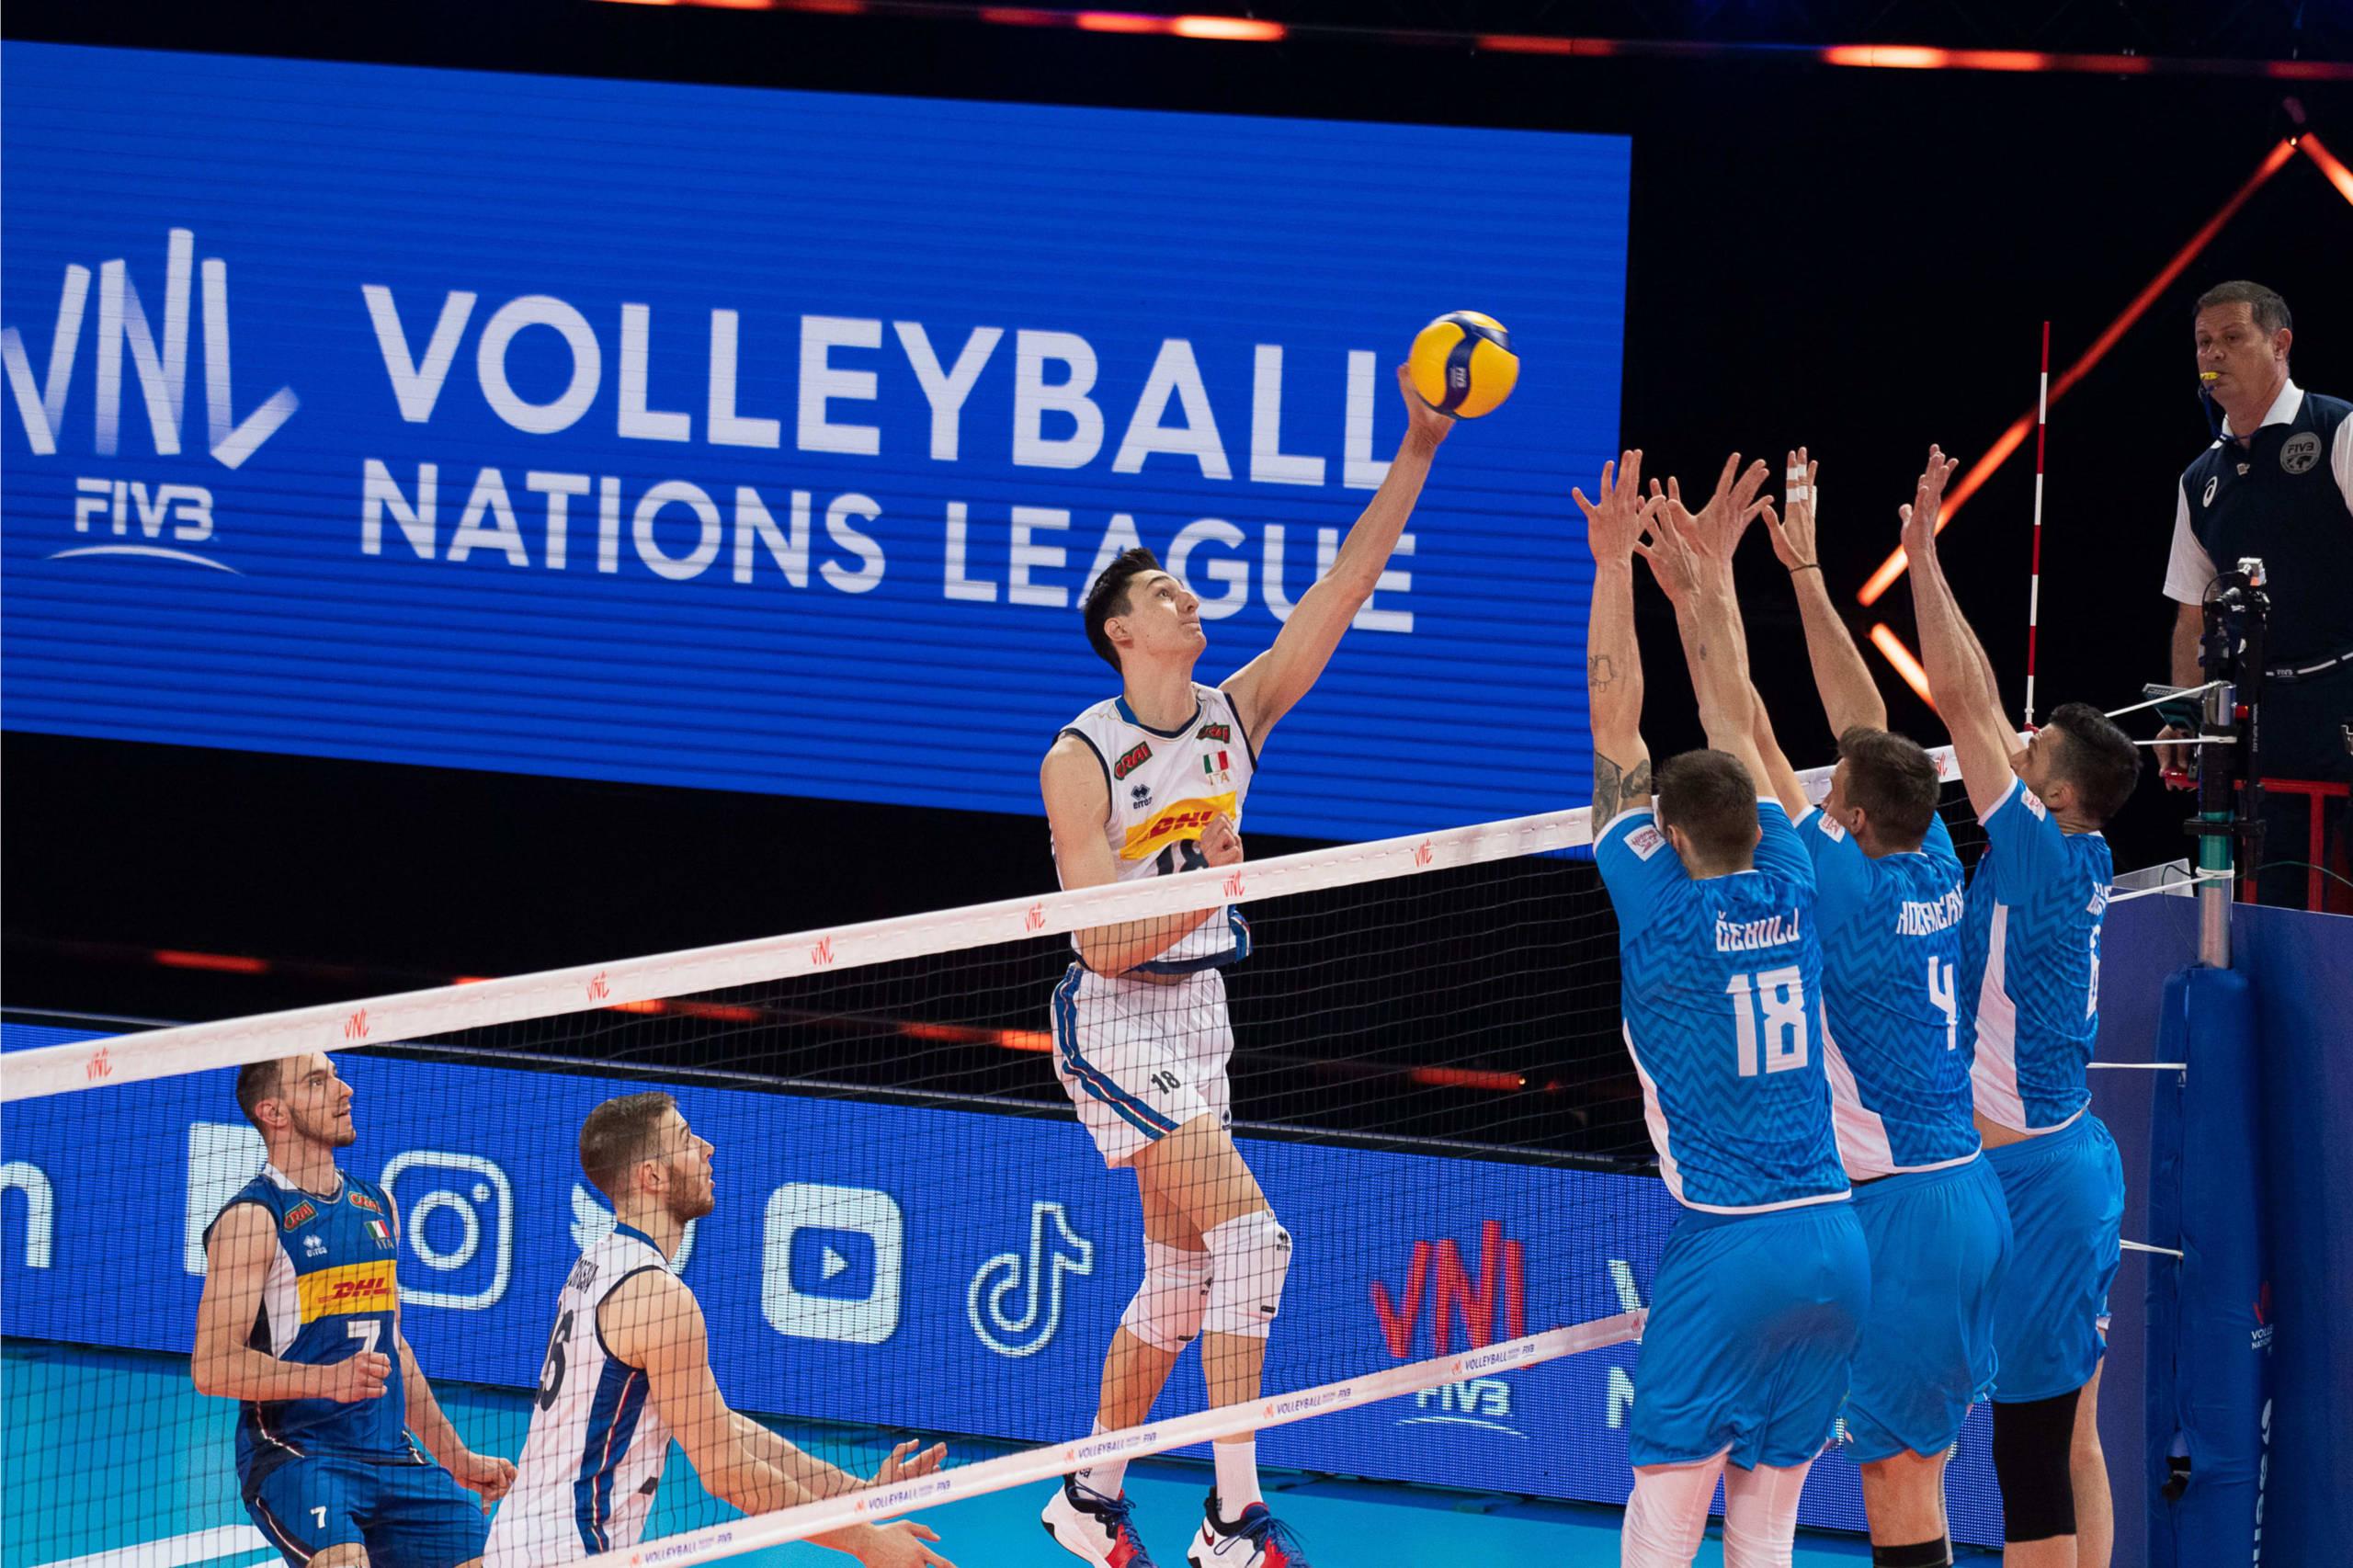 Volley, Pinali e Romanò campioni d'Europa…ma riserve in Superlega. Tra stranieri e moduli innovativi